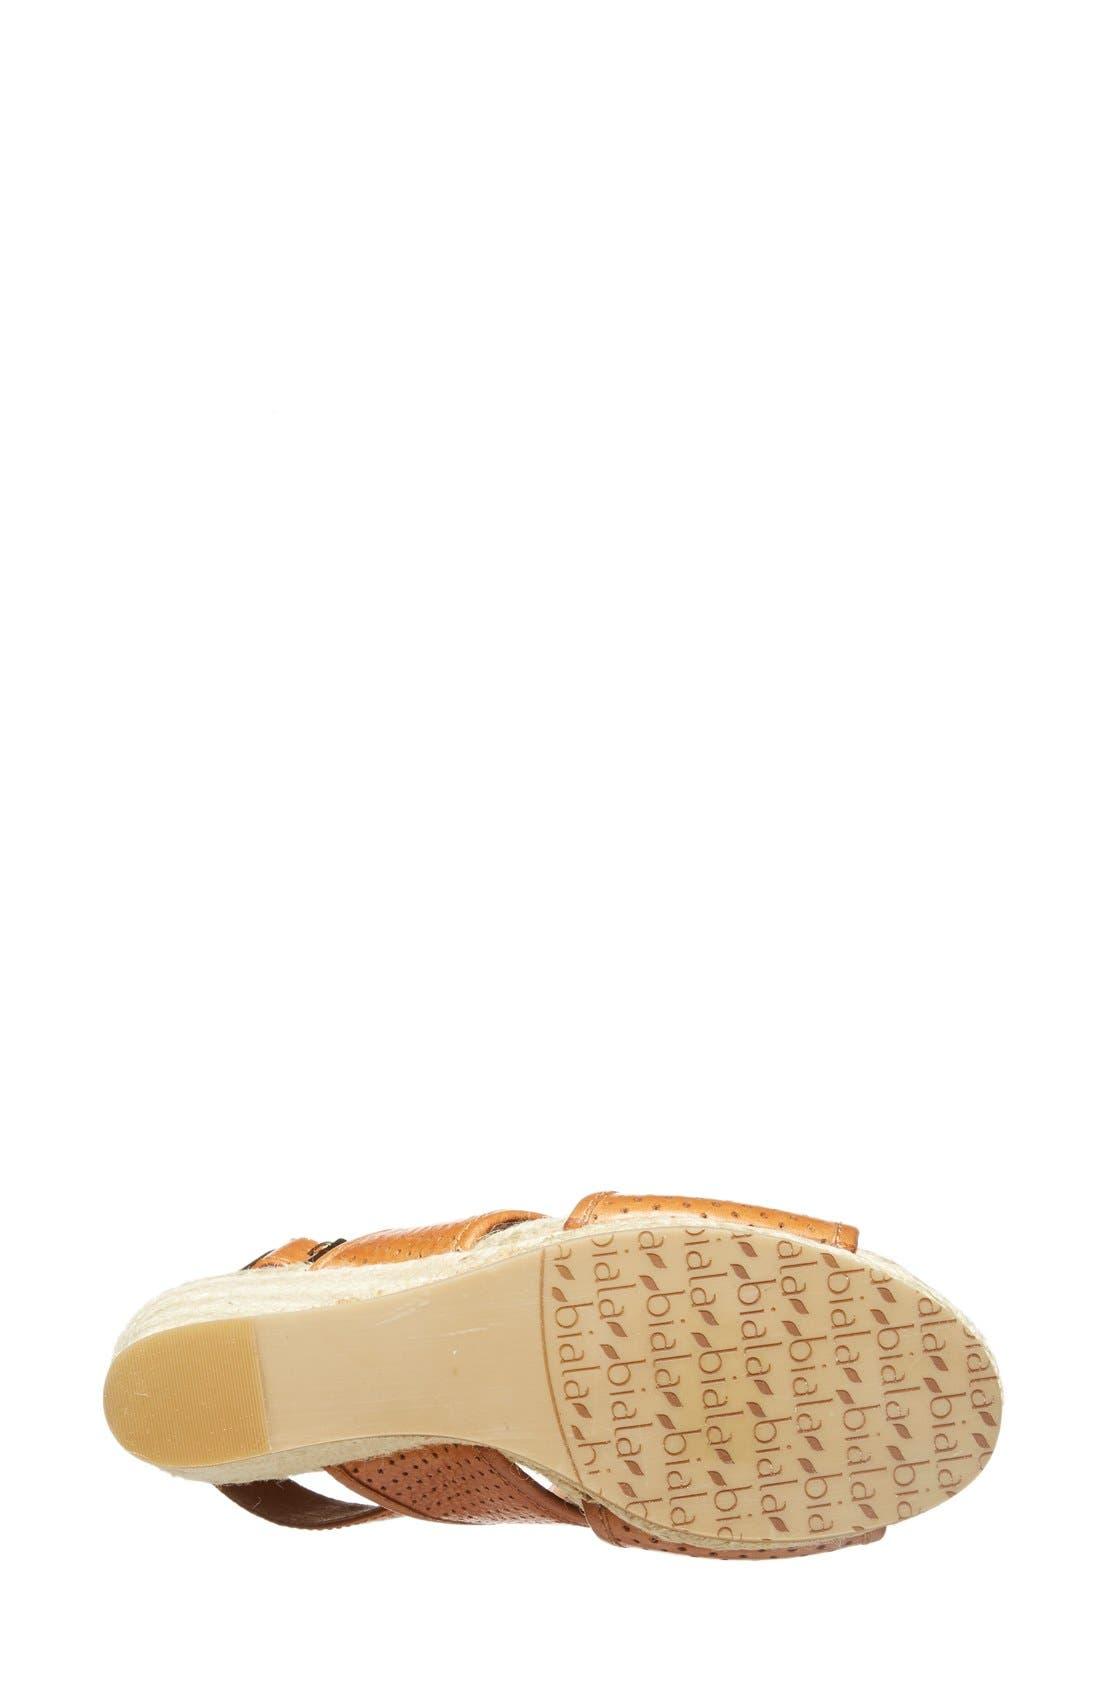 Alternate Image 4  - Biala 'Joyce' Perforated Espadrille Wedge Sandal (Women)